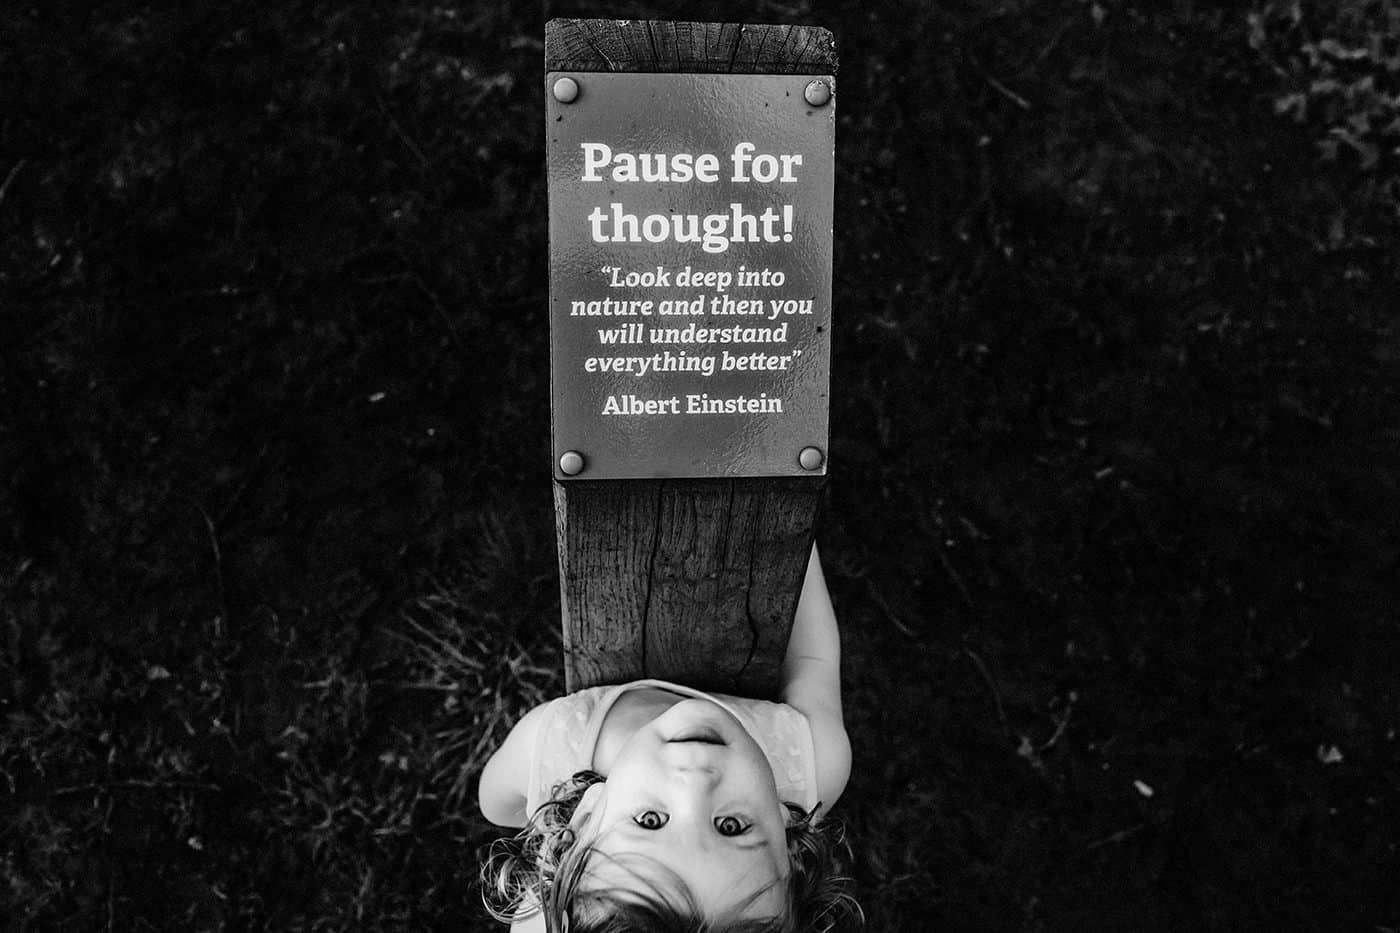 Child poses by Einstein quote